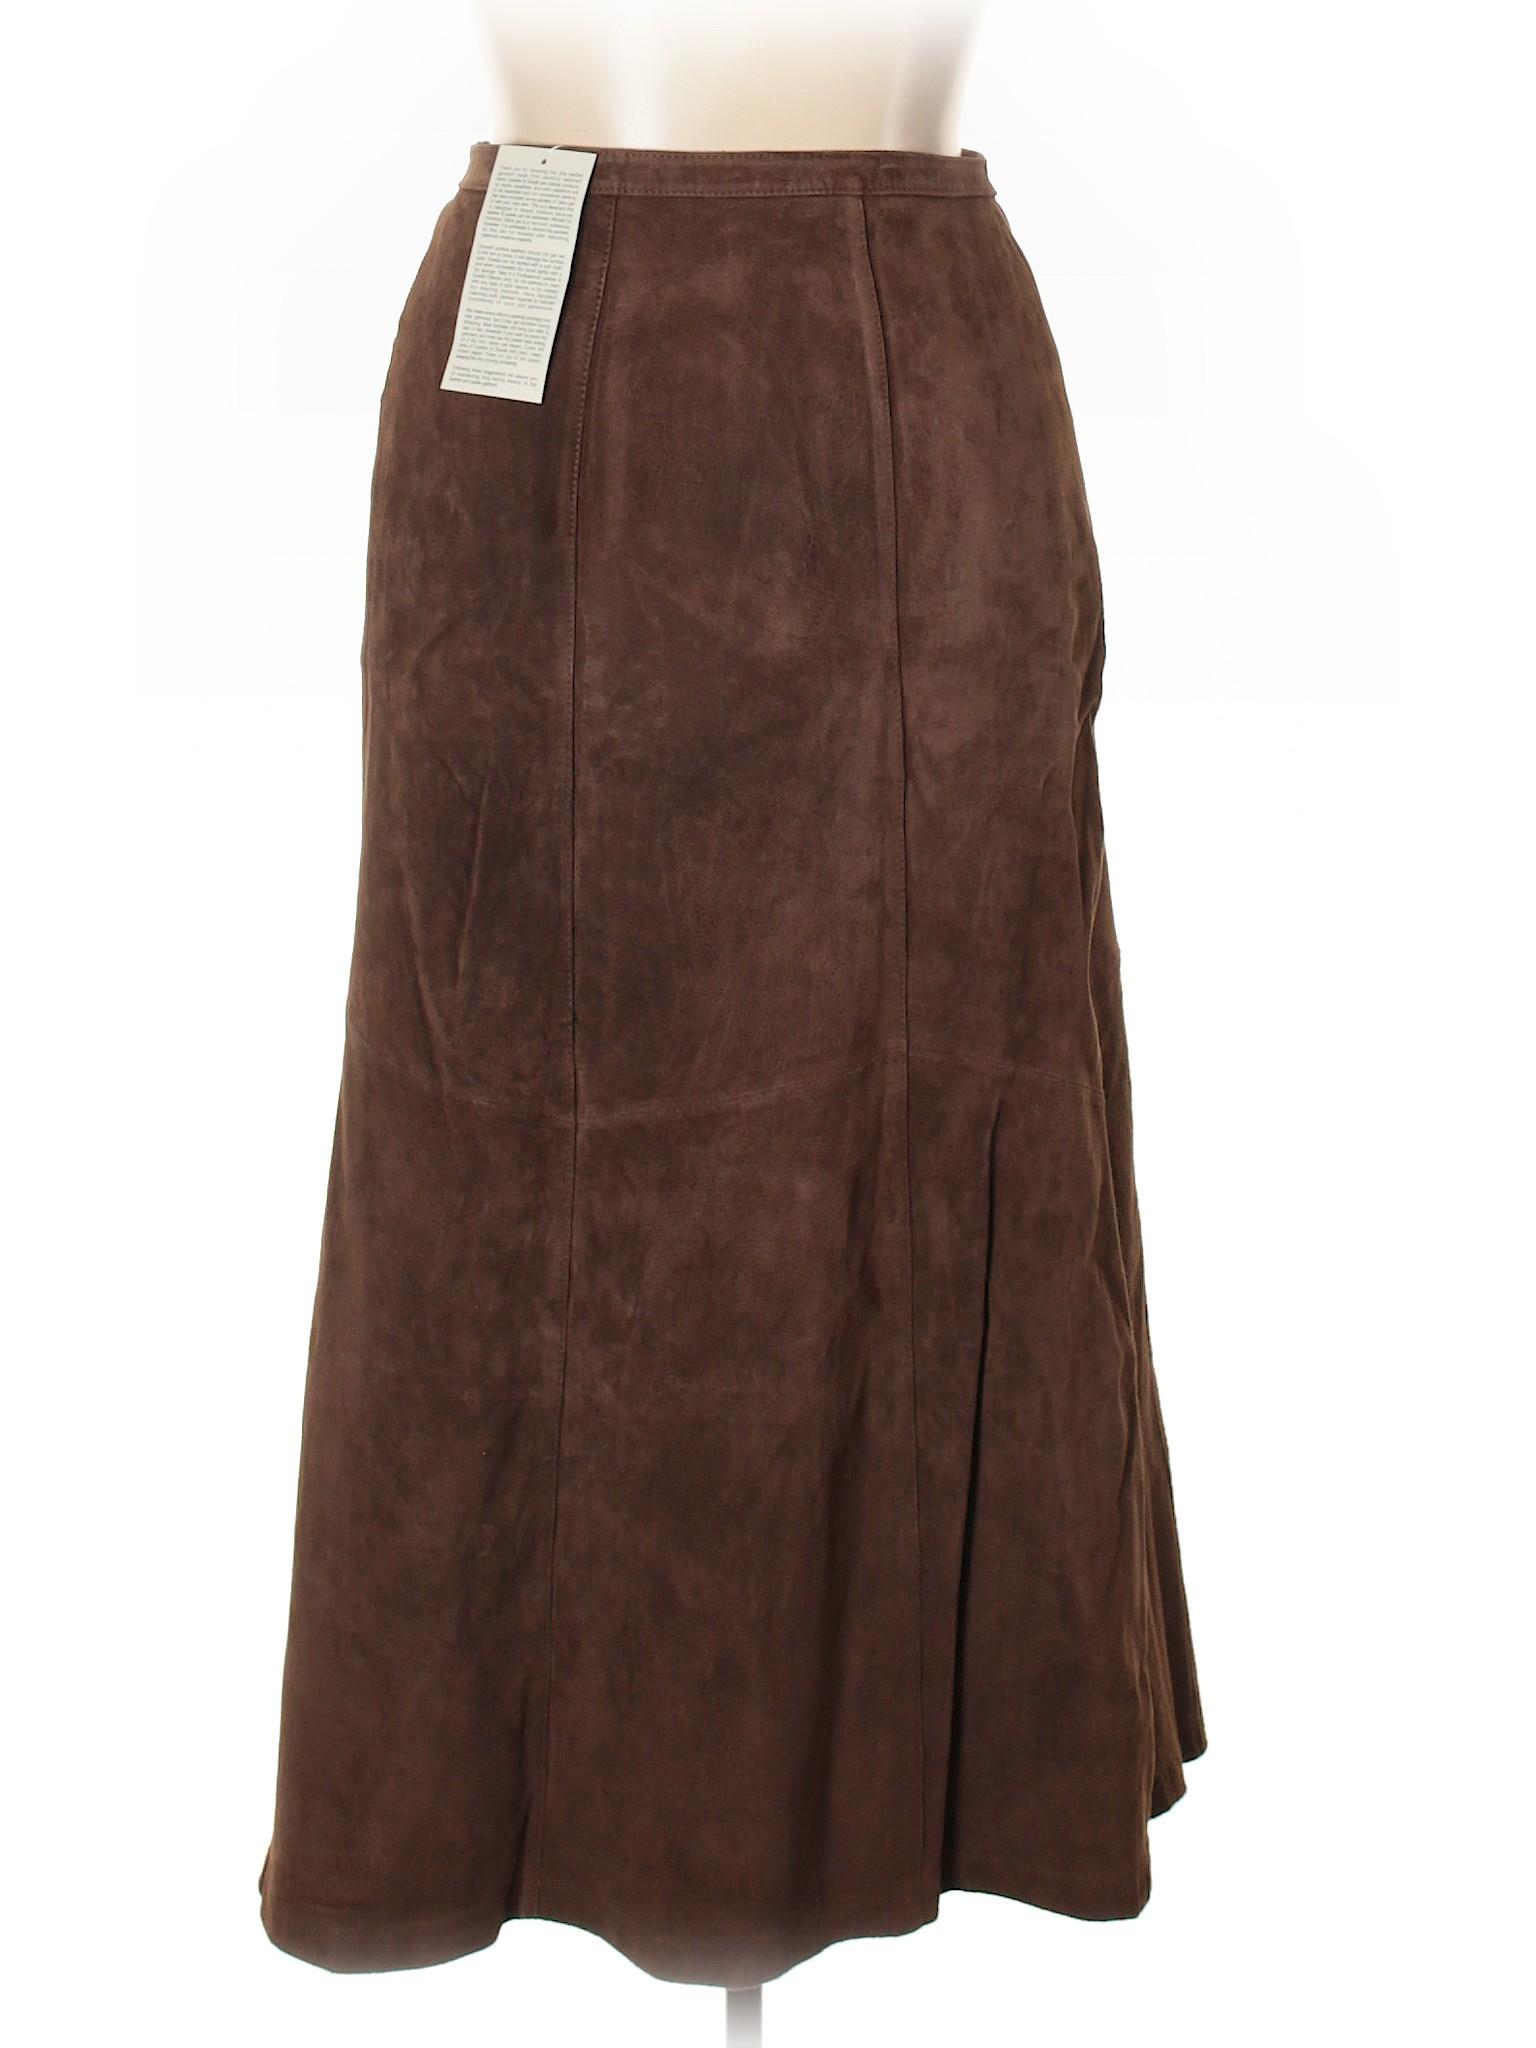 Boutique Boutique Skirt Leather Leather 1pPxnpU